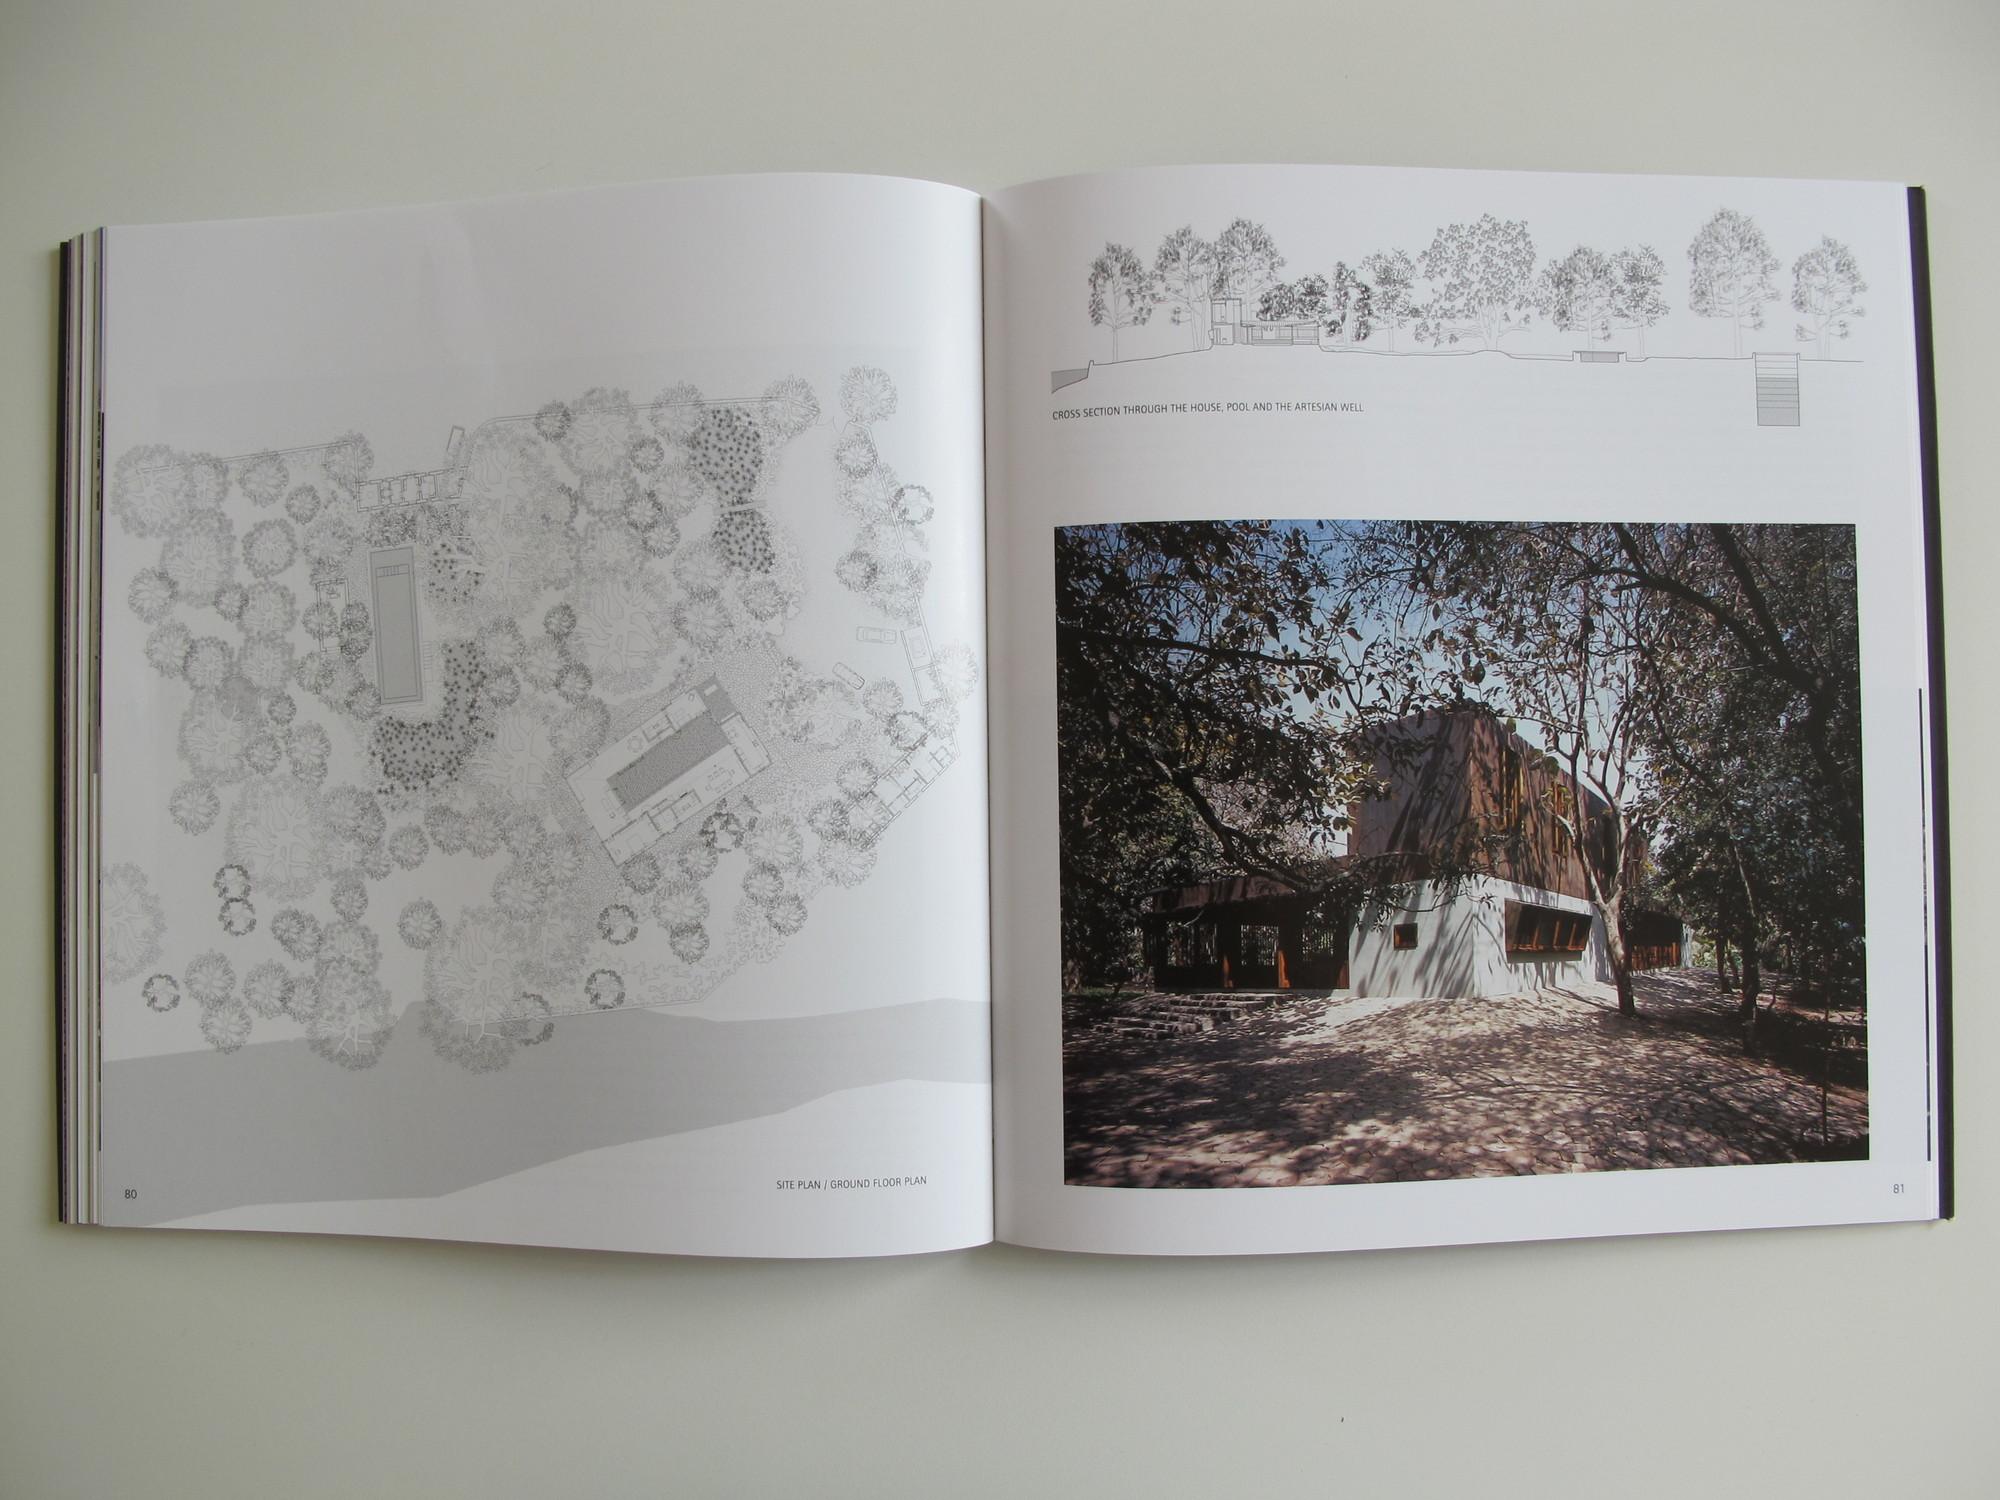 Bijoy JAIN-Spirit of Nature Wood Architecture Award 2012